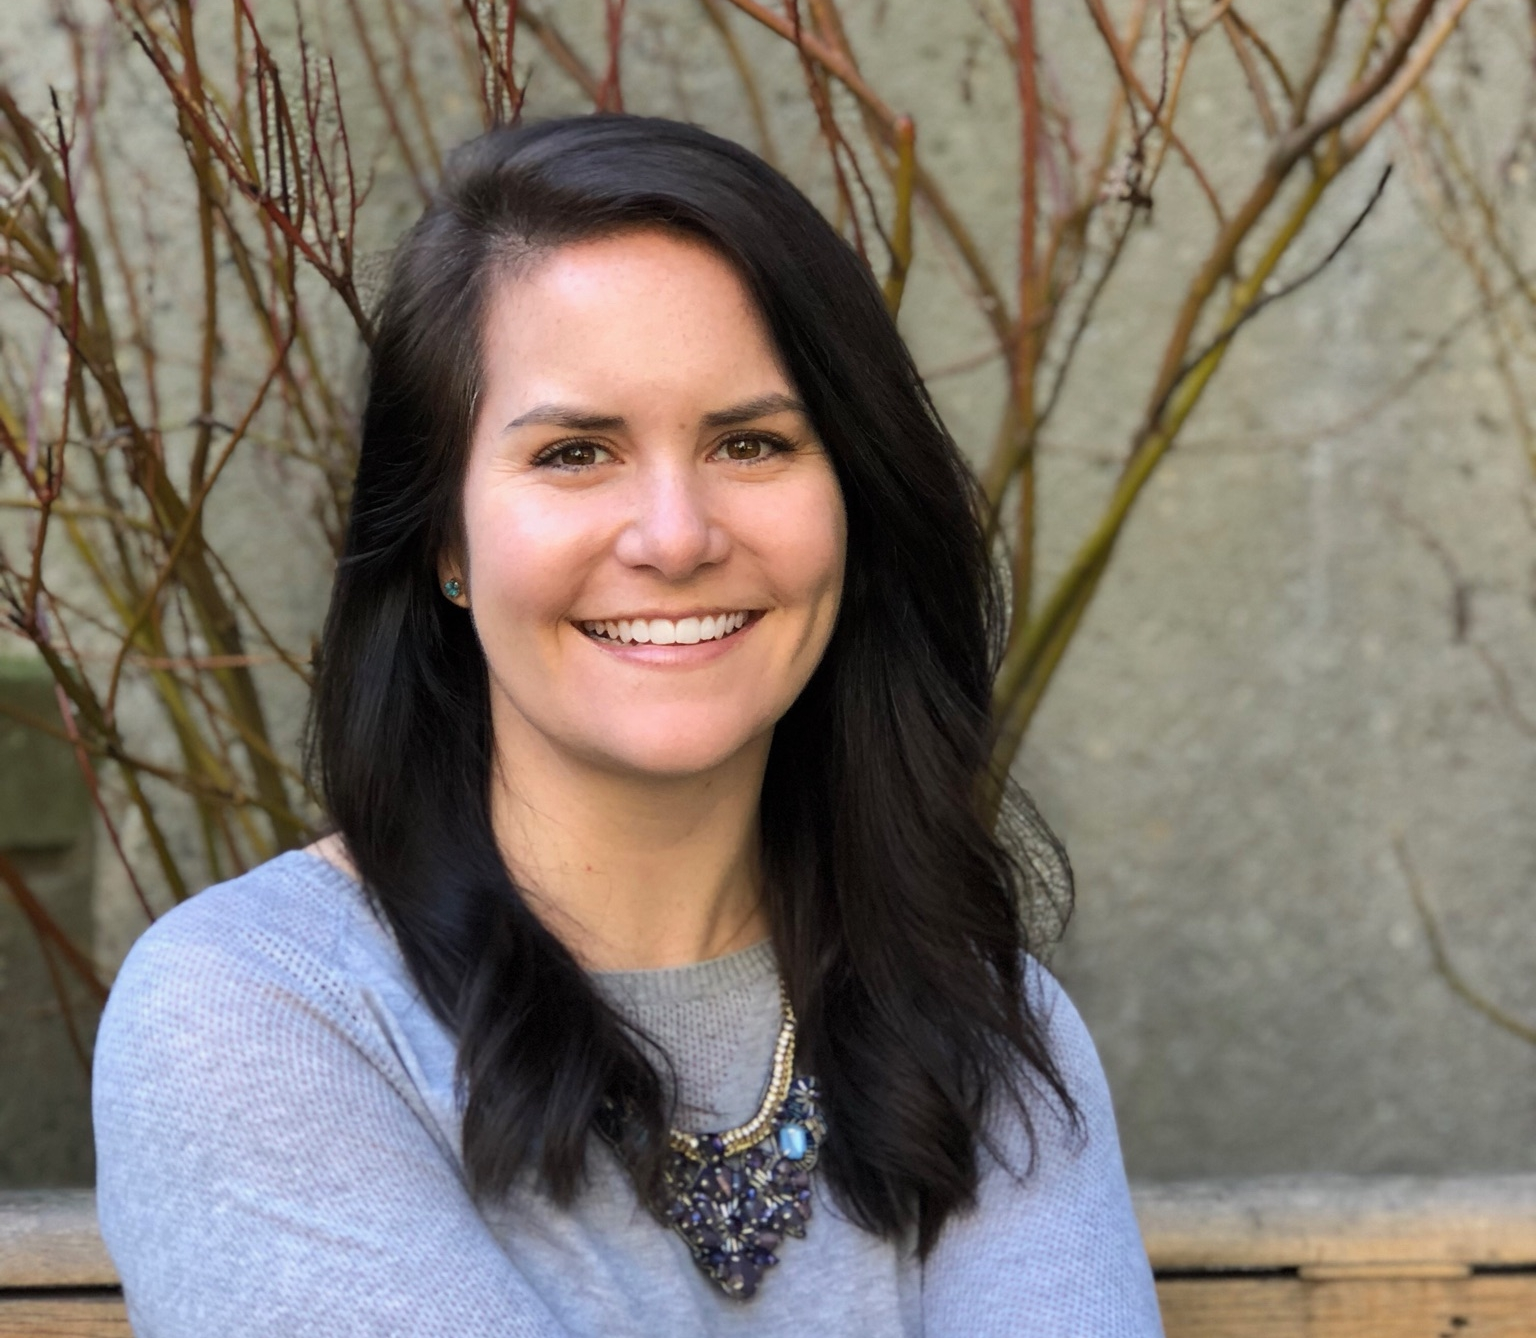 Megan Meier, Director of Special Events